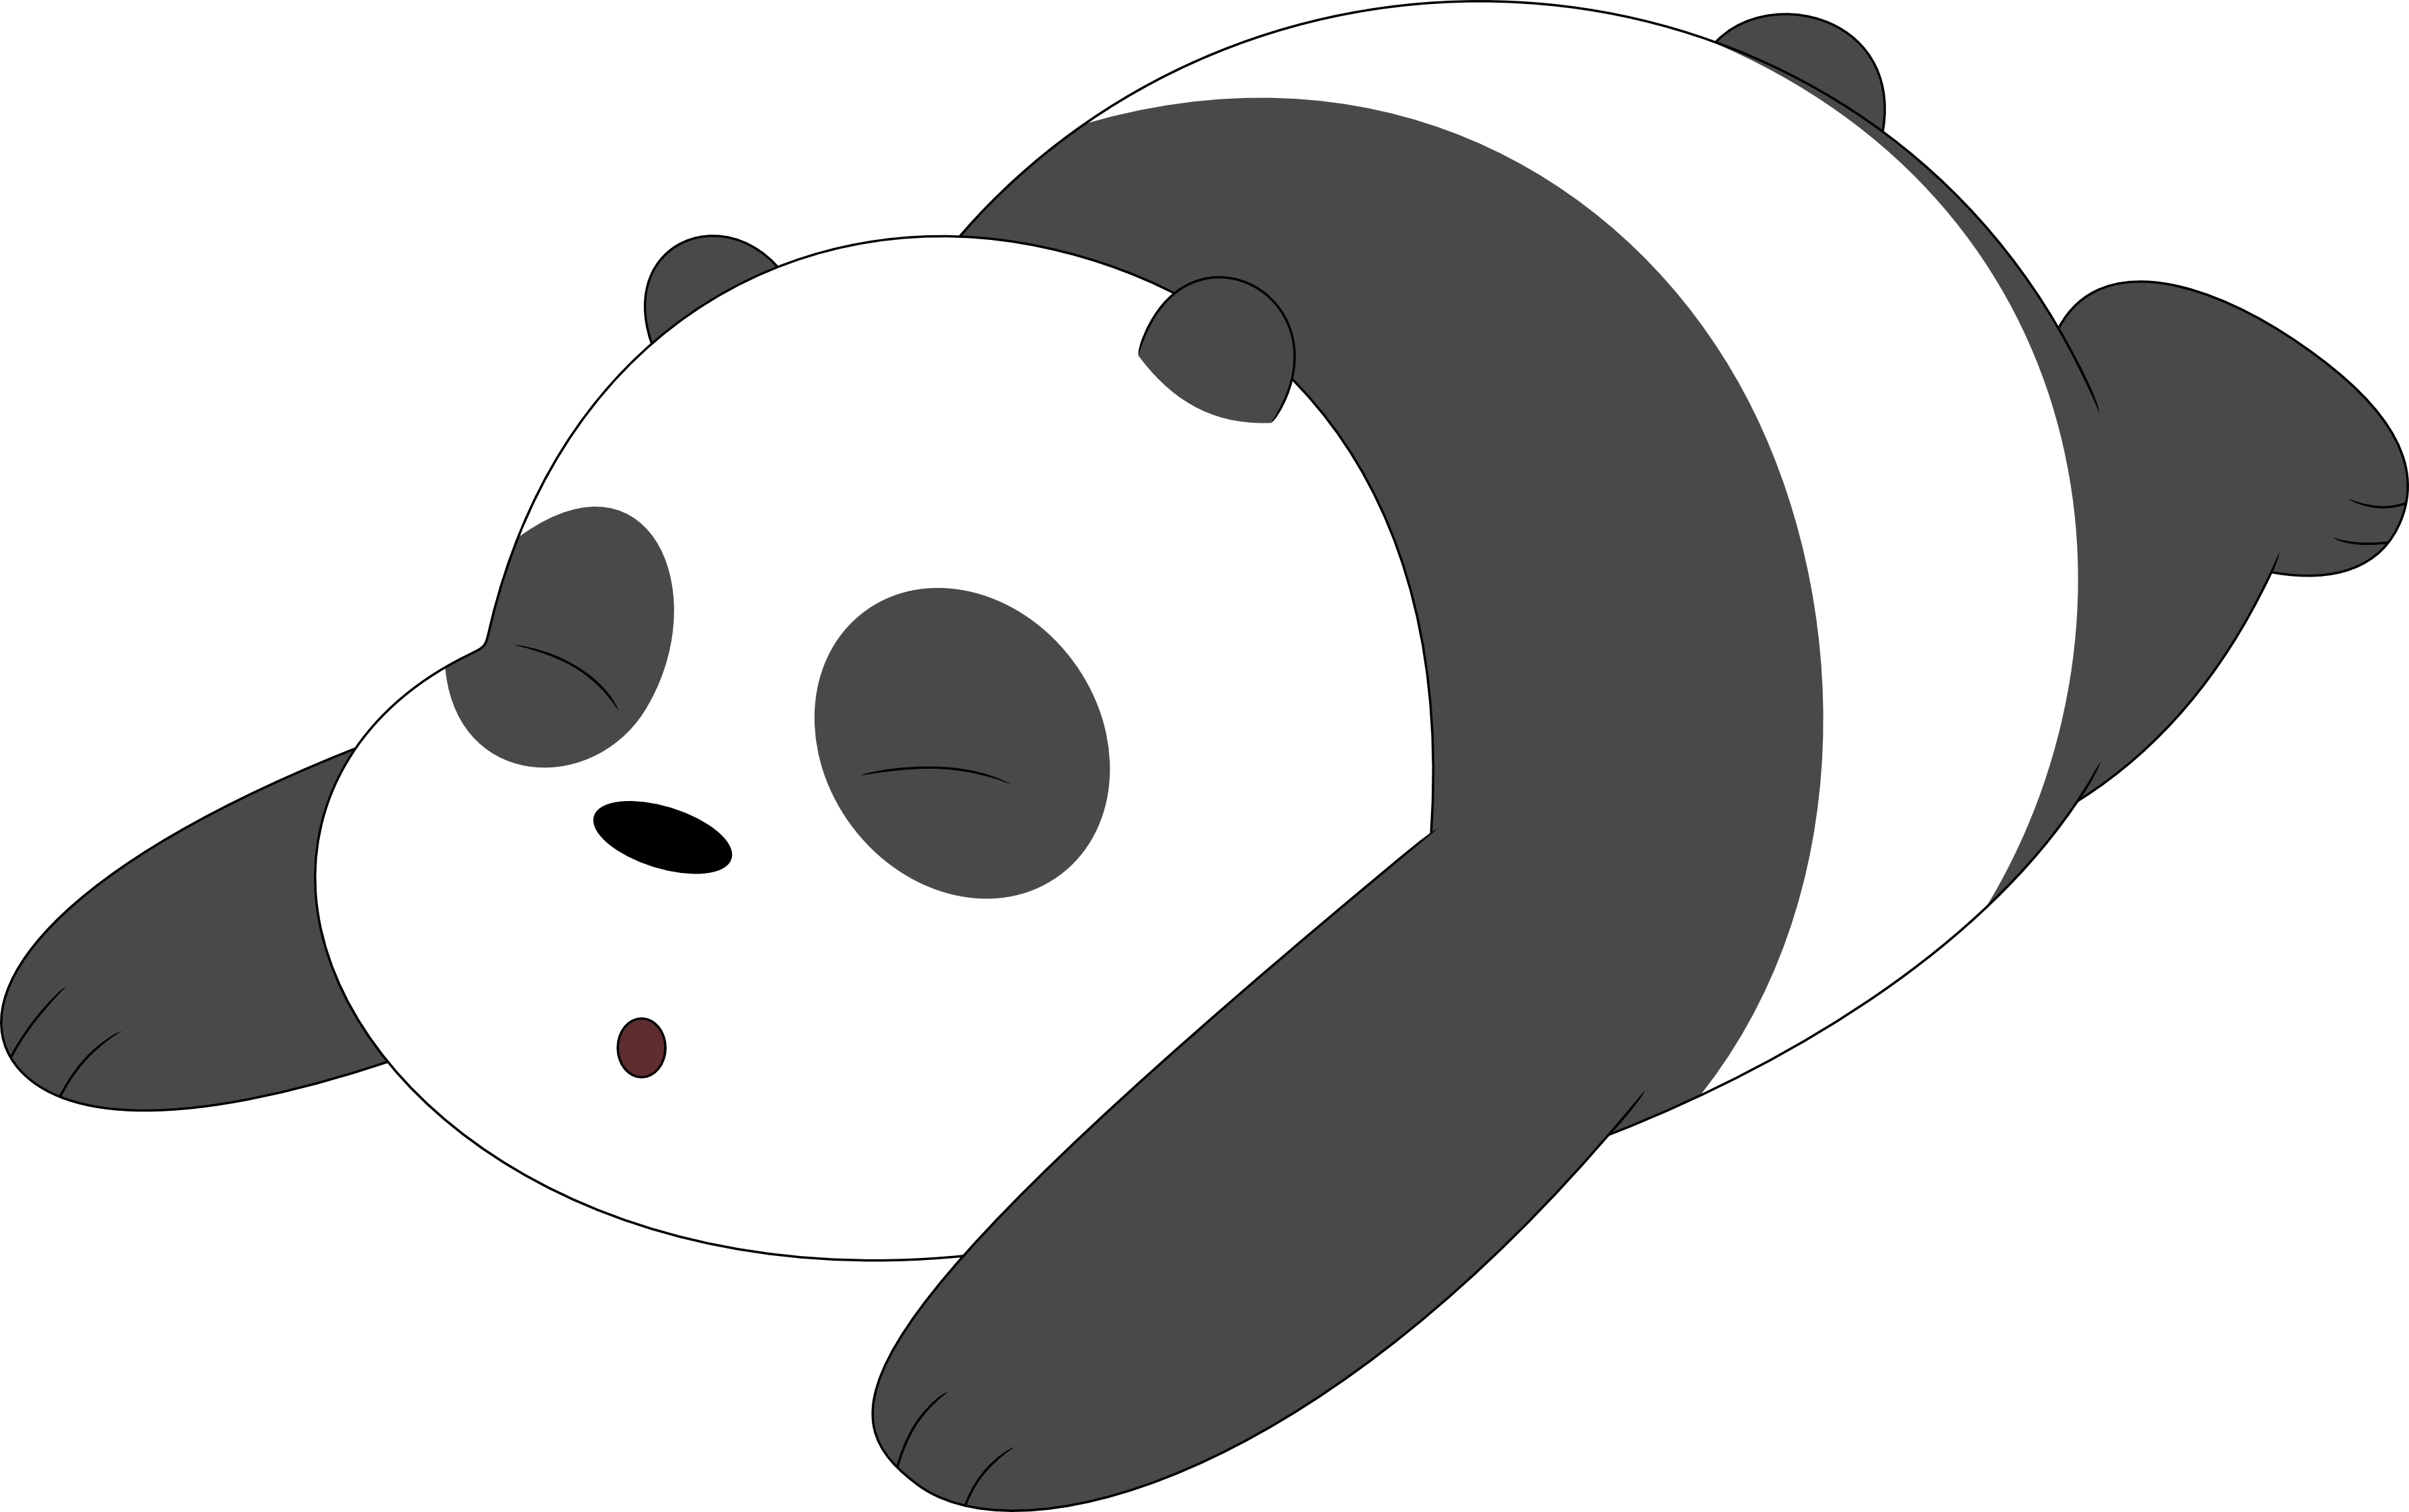 Transparent chicago bears clipart - We Bare Bears Panda Png - Panda We Bare Bear